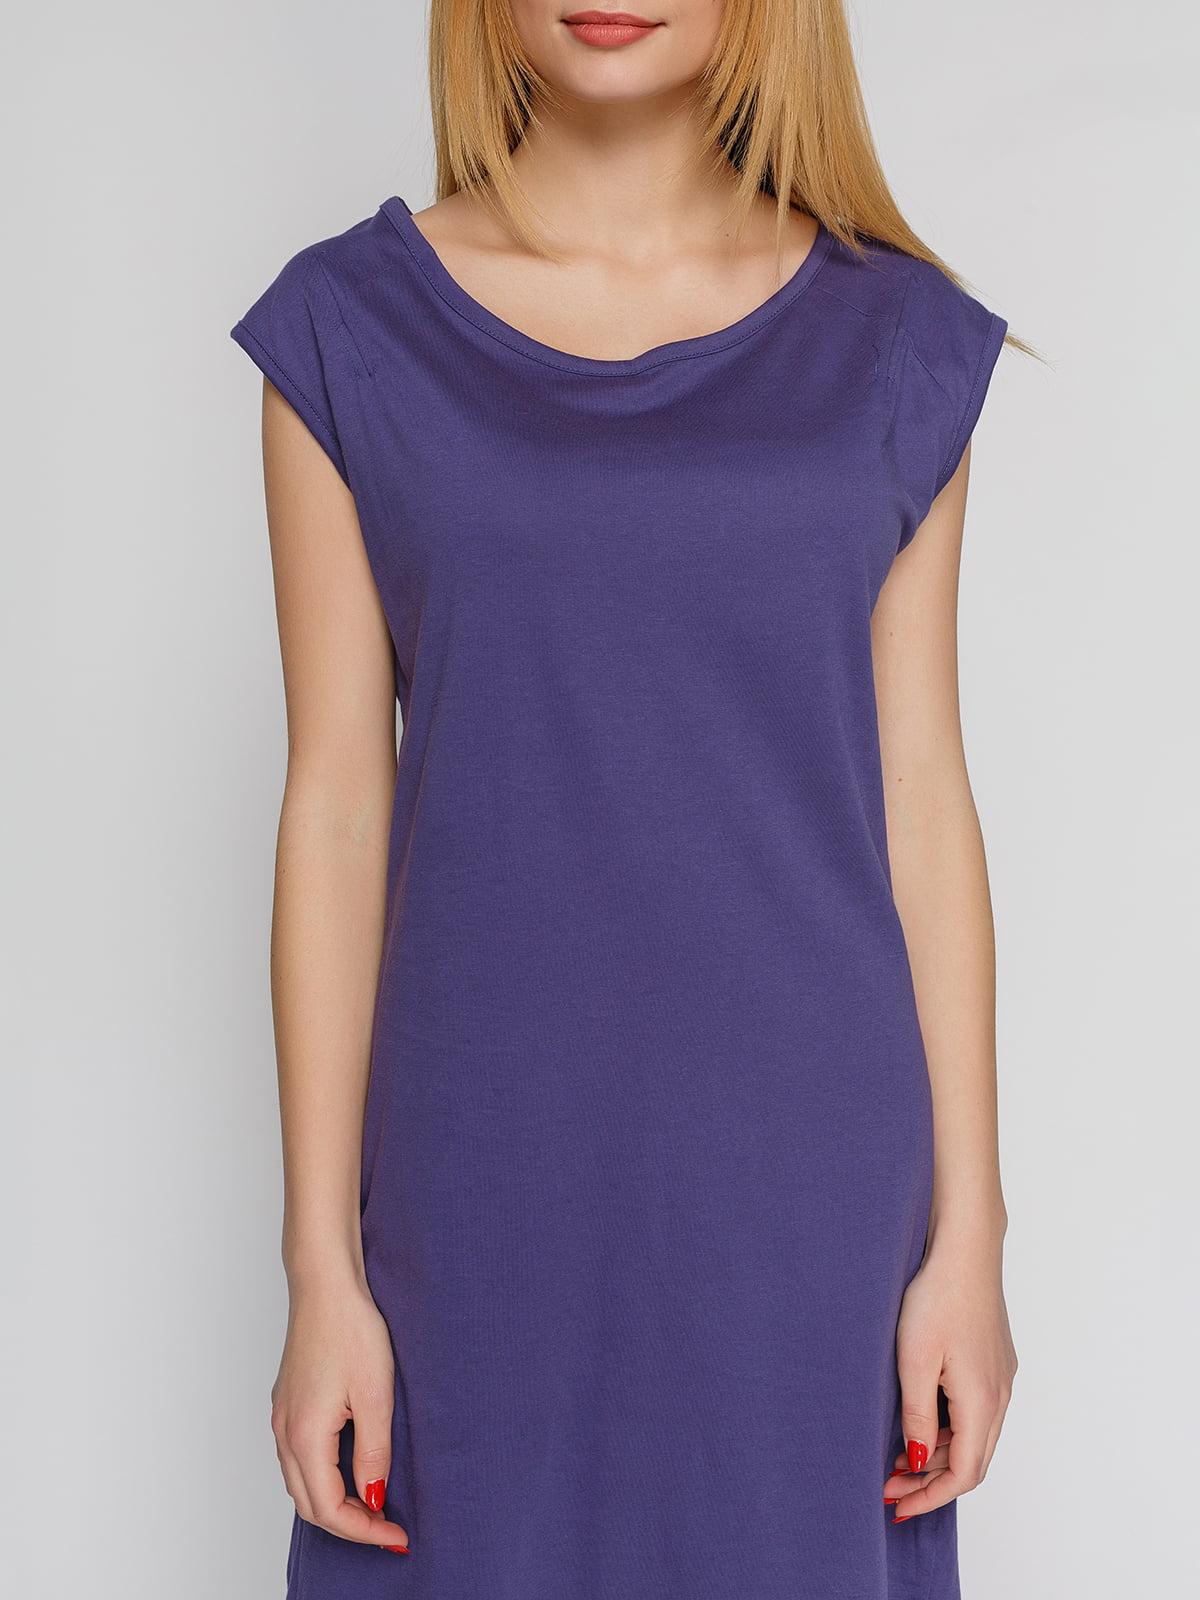 Сукня темно-фіолетова | 4855333 | фото 3